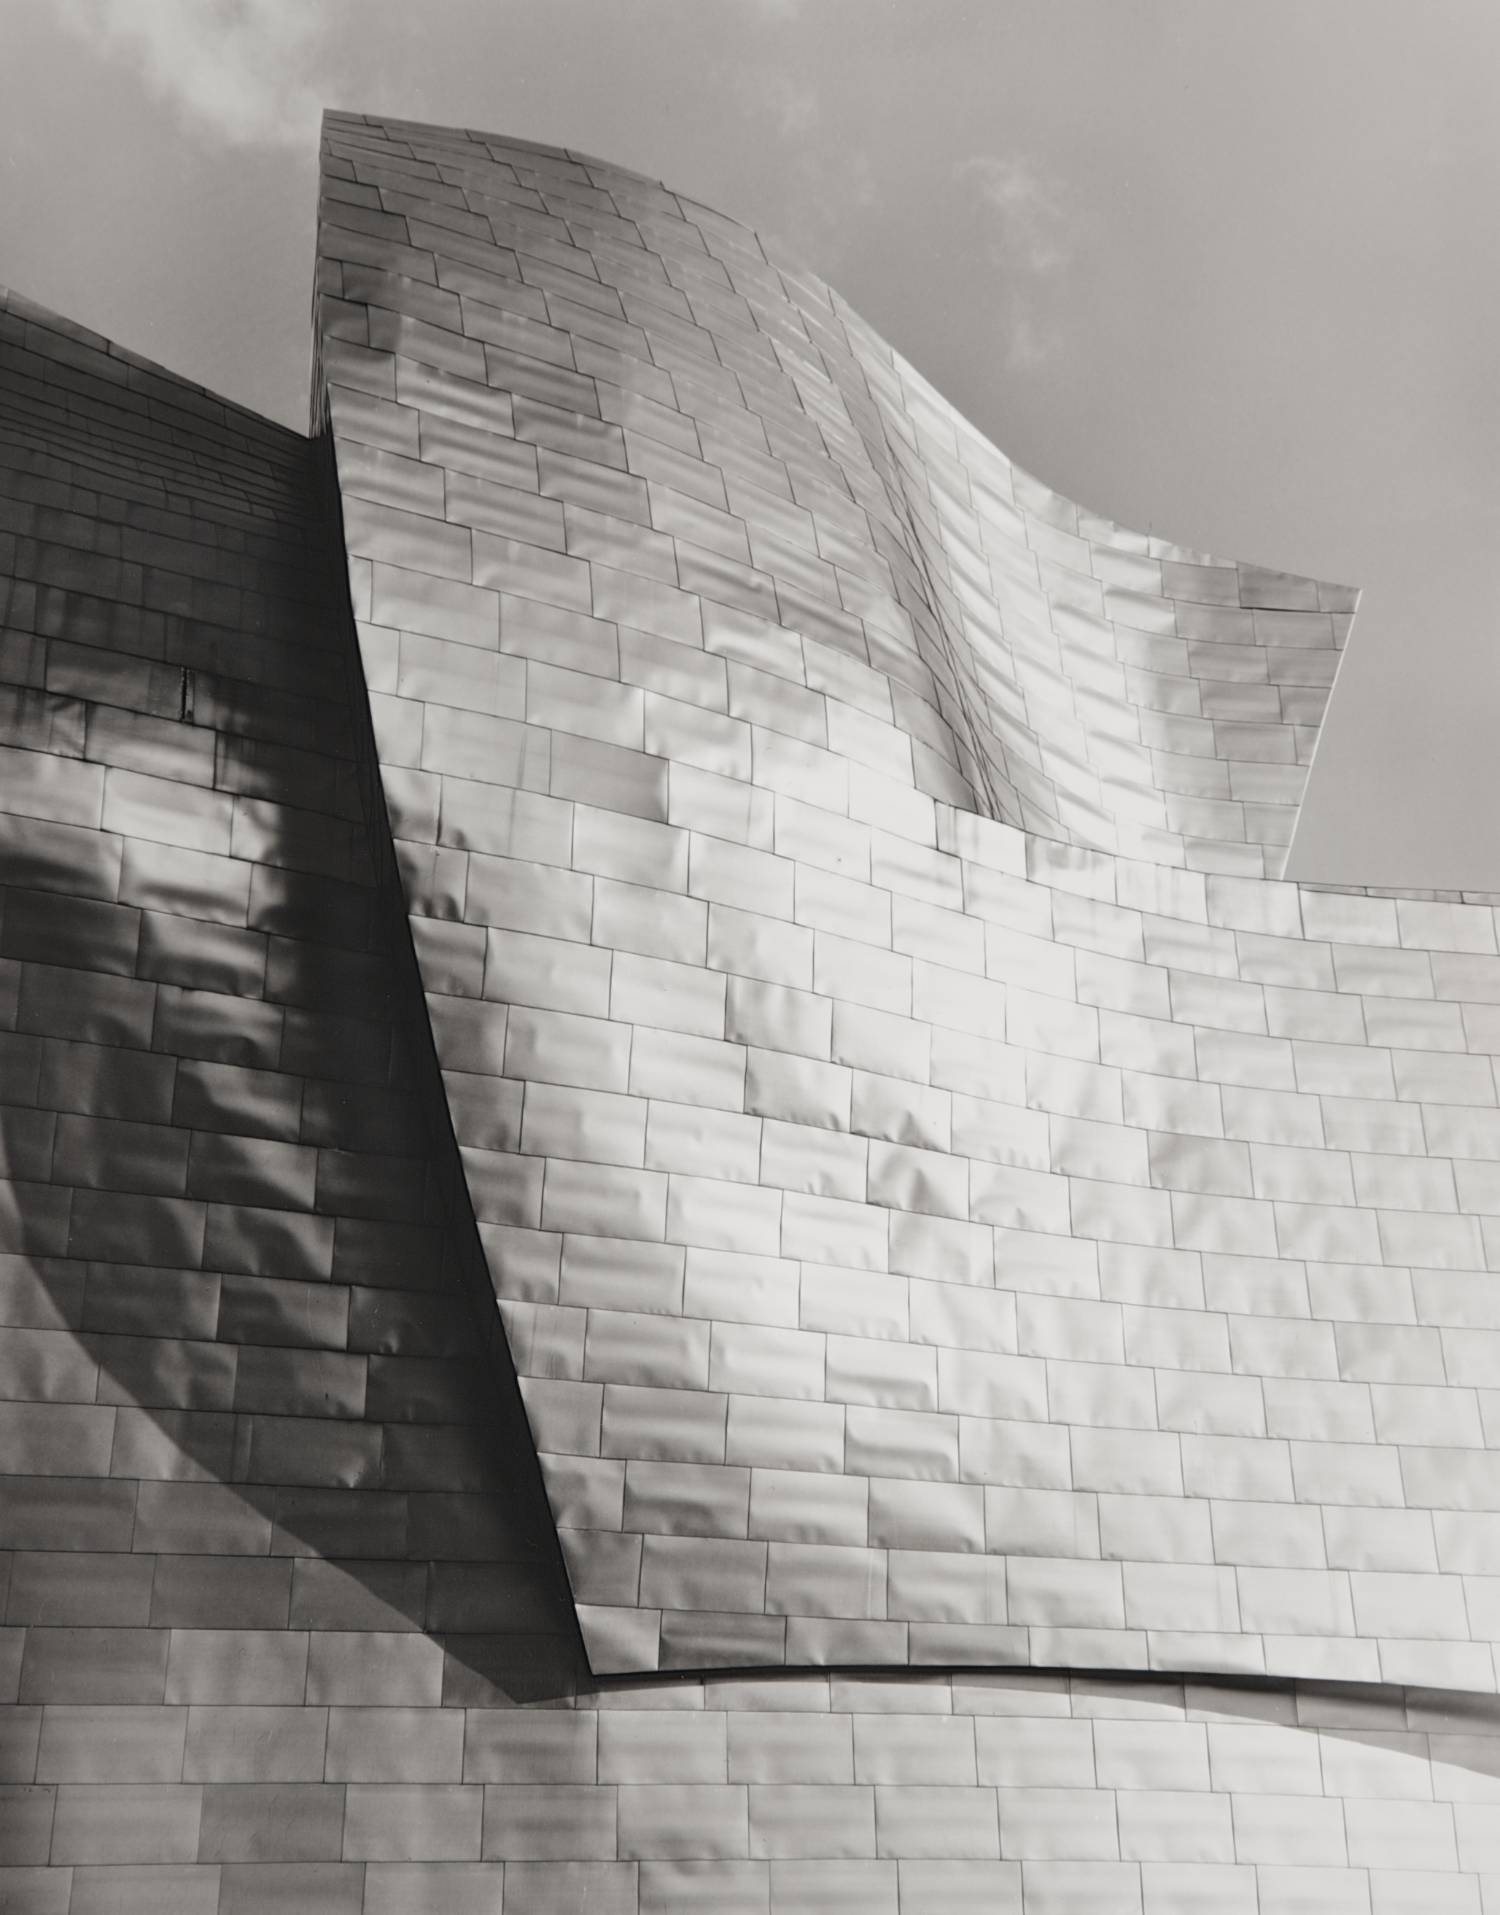 Guggenheim Sail (Bilbao, Spain)